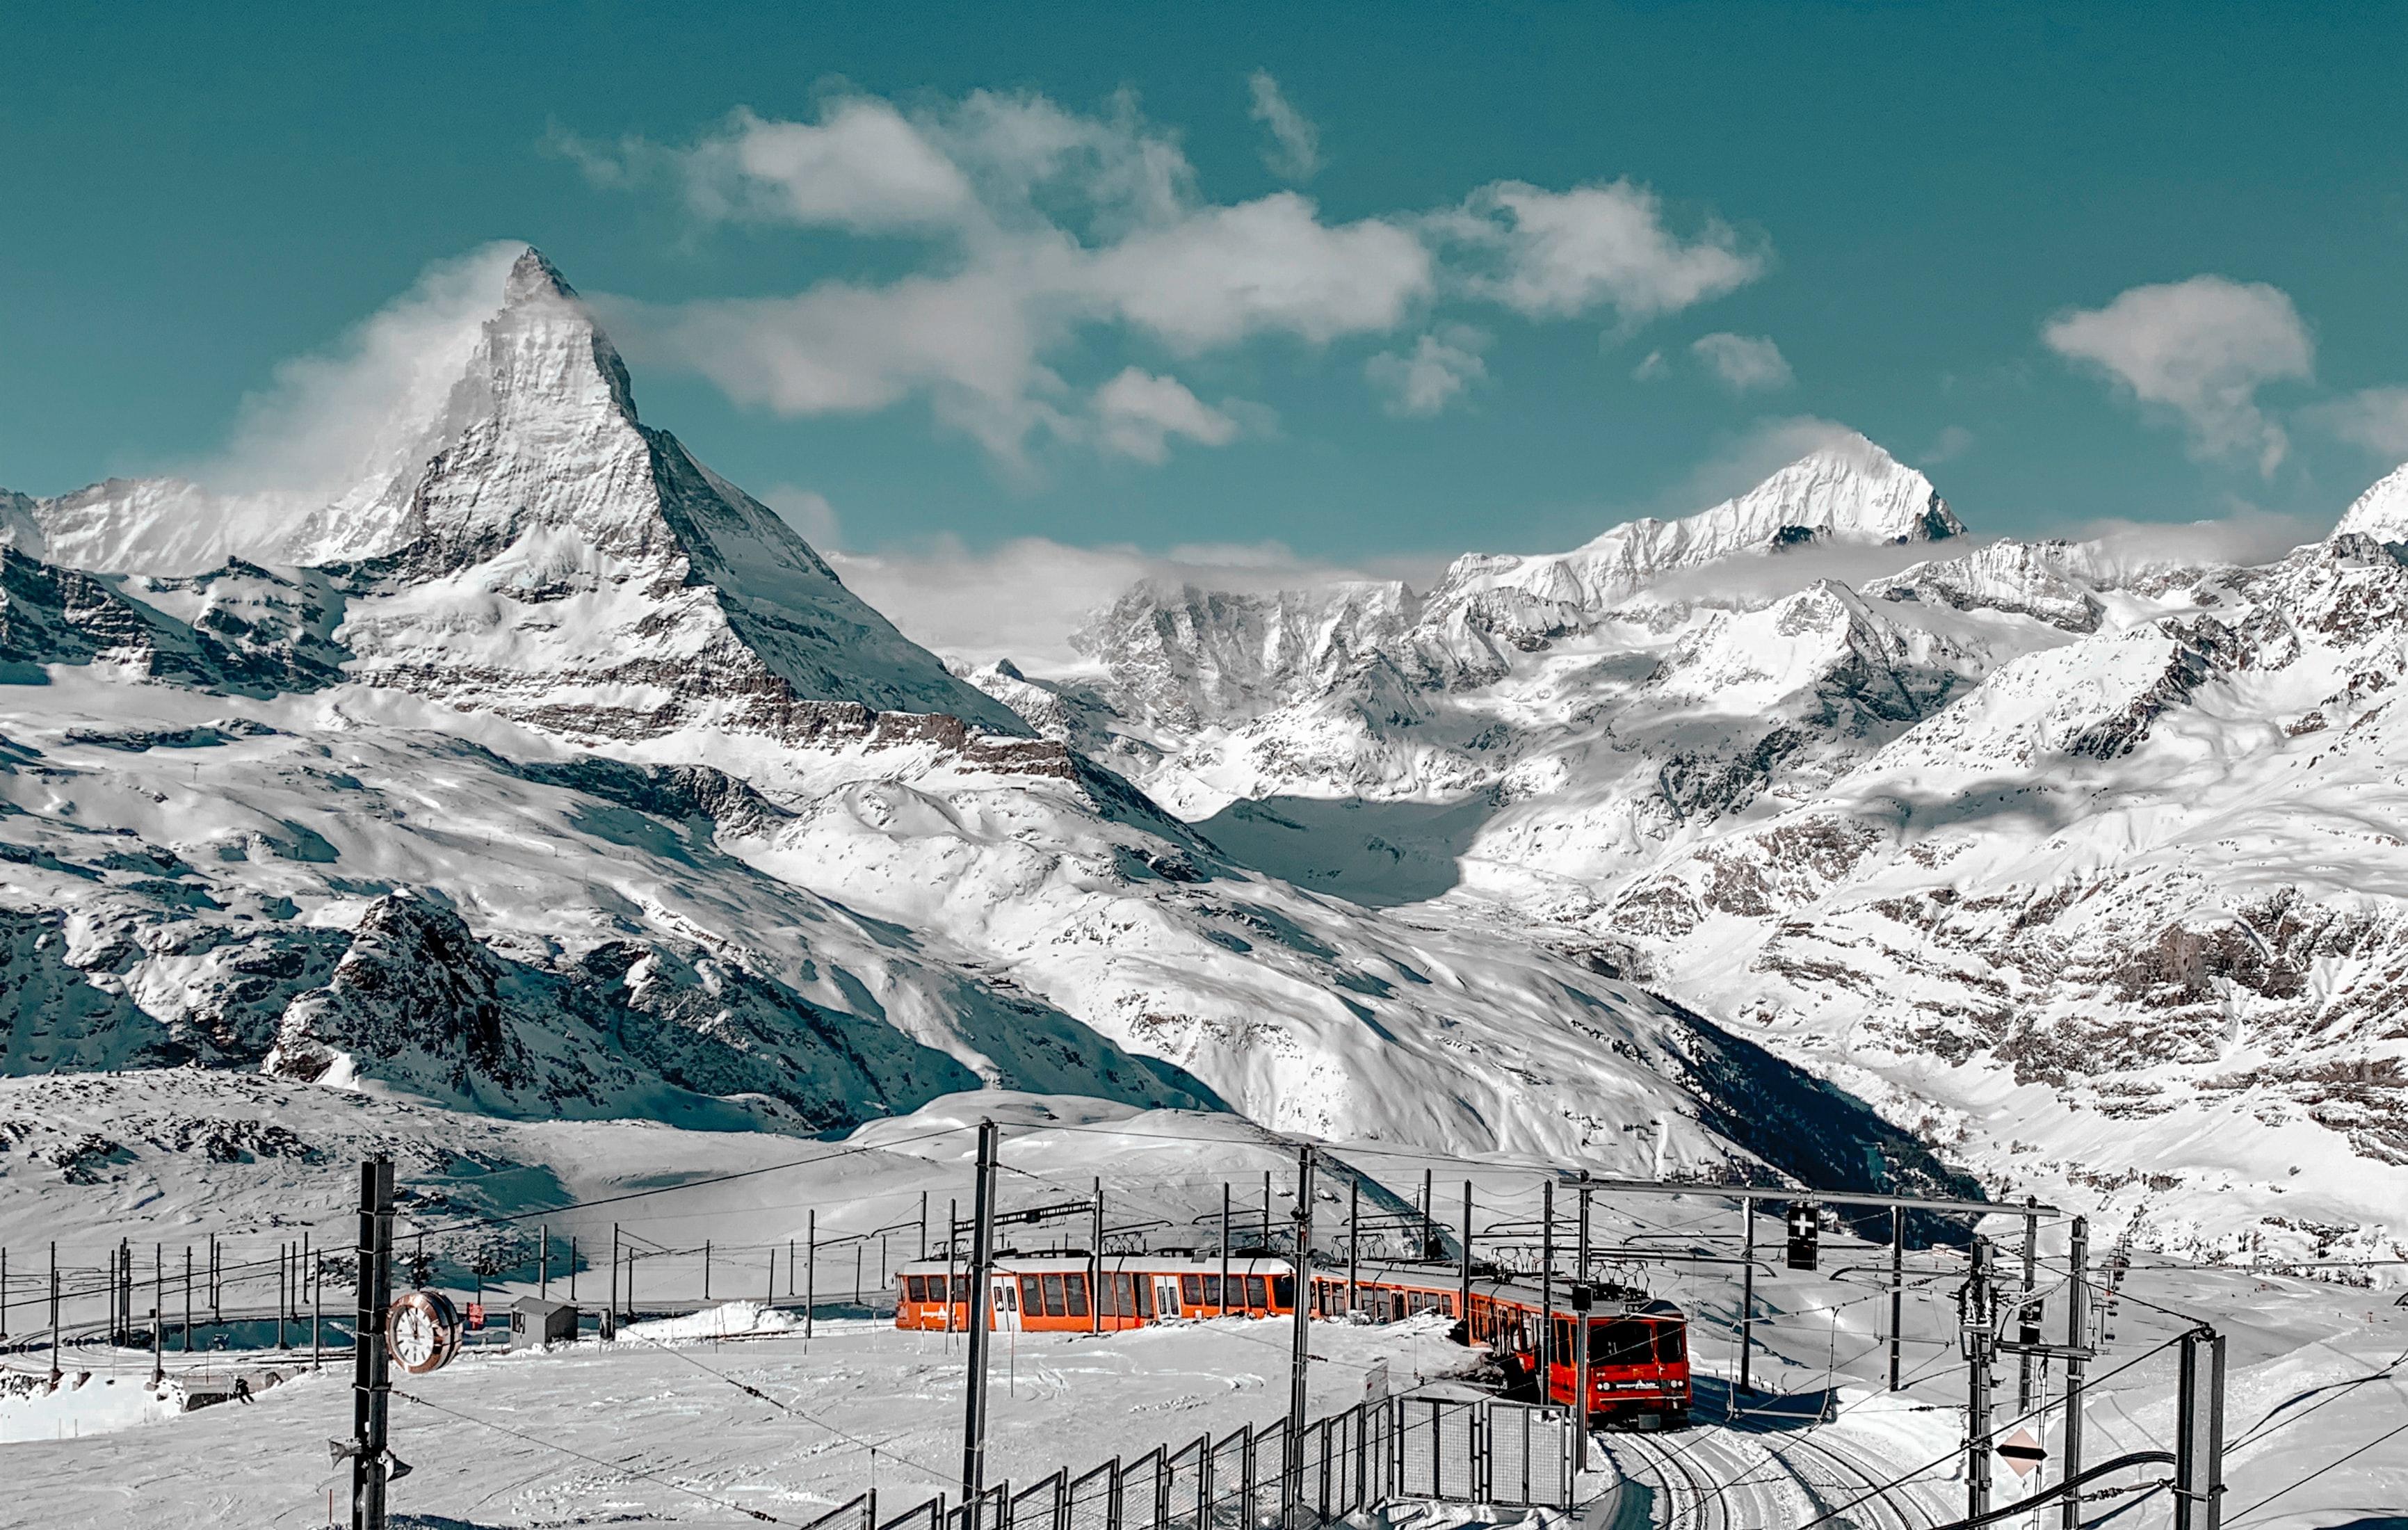 zermatt, 15 things to do to enjoy nightlife in Switzerland